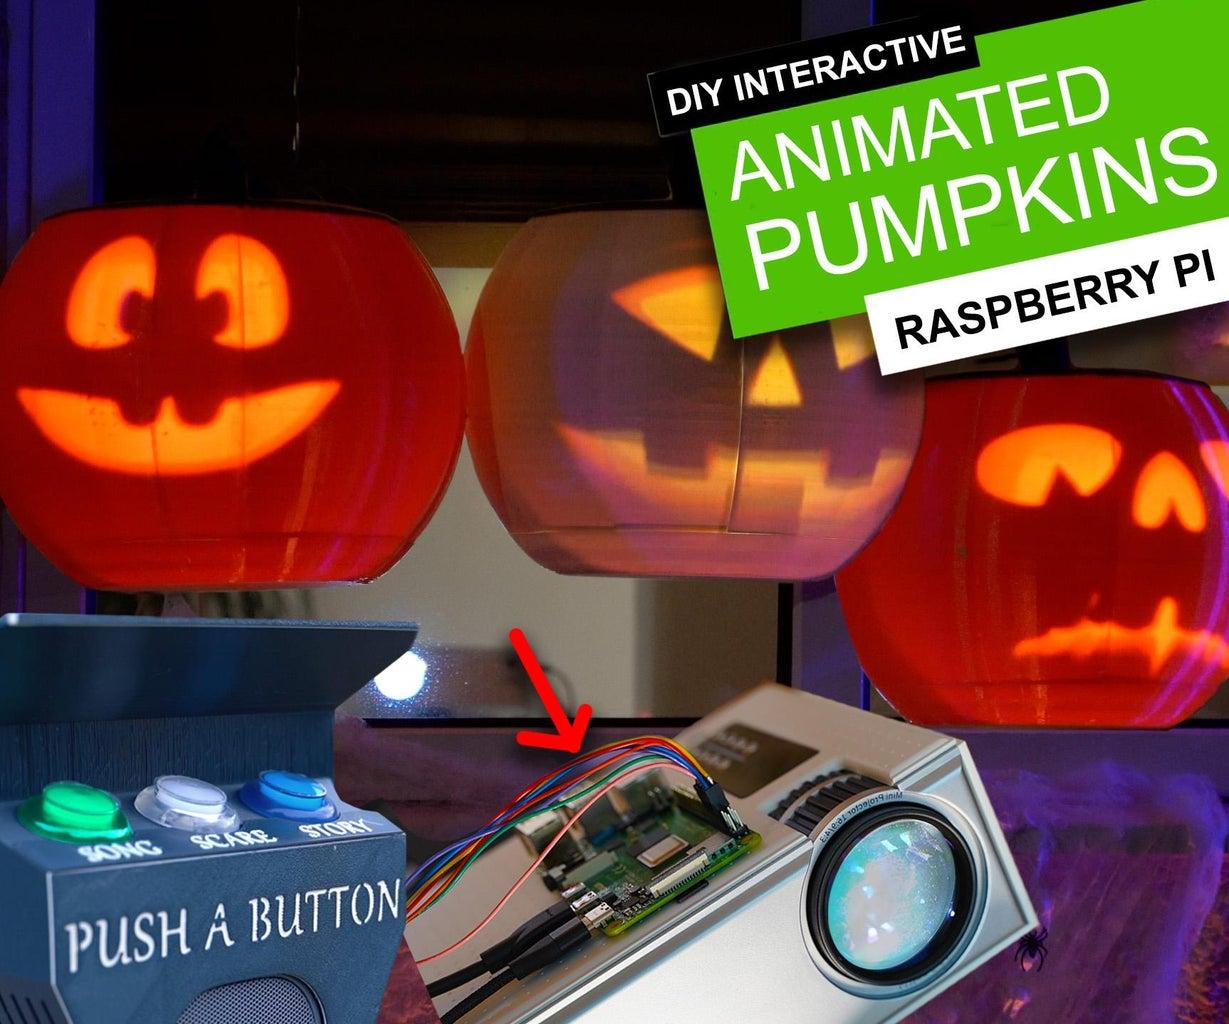 DIY Interactive Animated Pumpkins - 3D Printed   Raspberry Pi